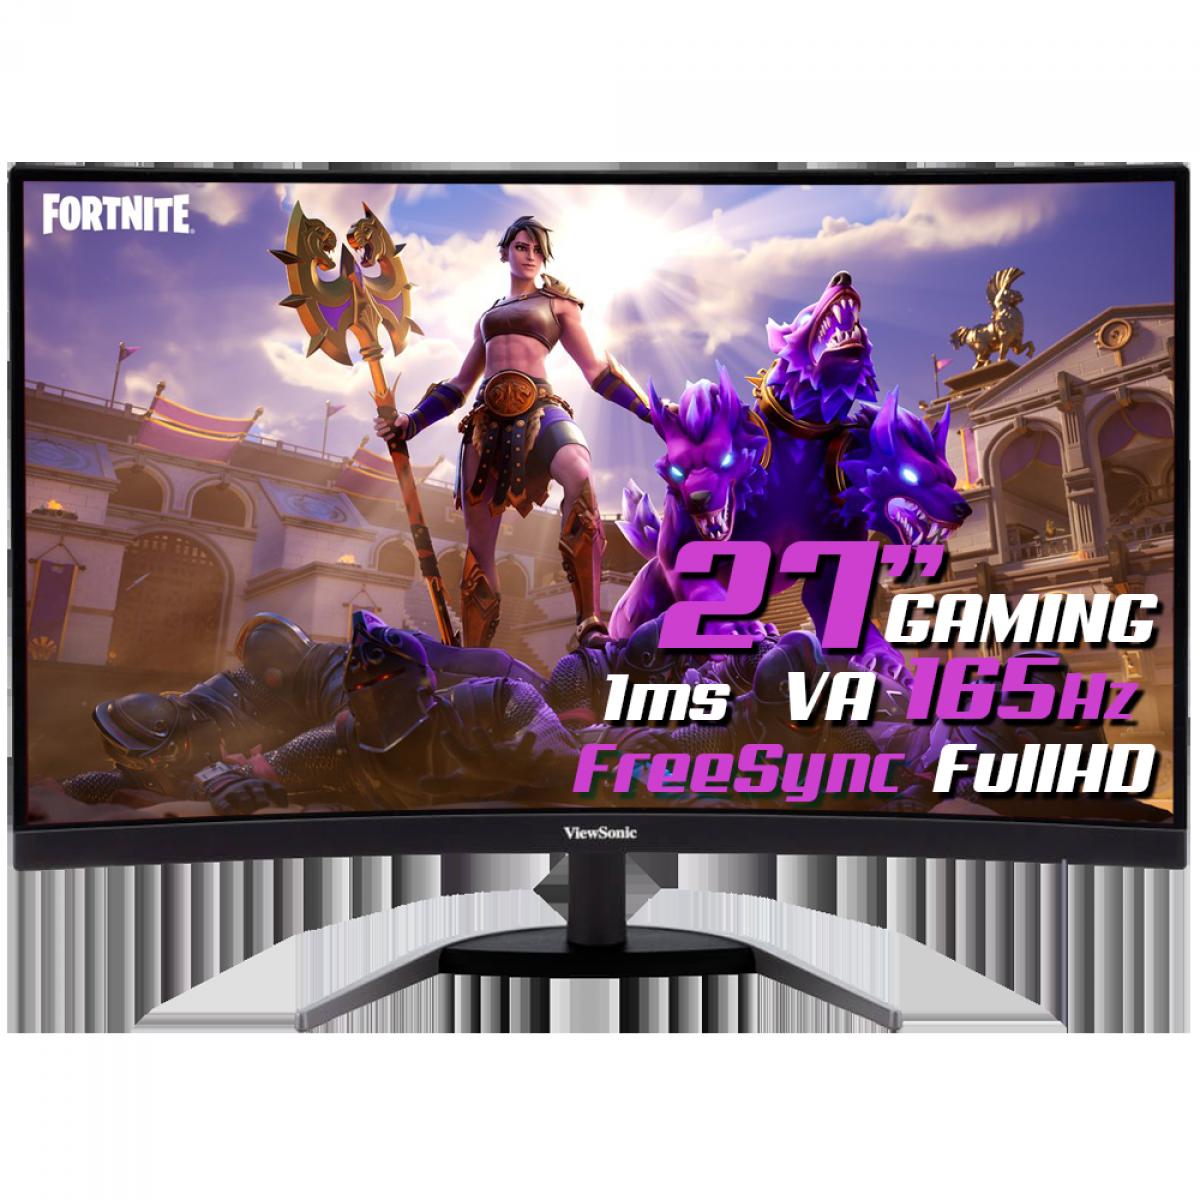 Monitor Gamer ViewSonic, 27 Pol, Curvo, FullHD, 165Hz, 1ms, HDMI/DP, VX2768-PC-MHD